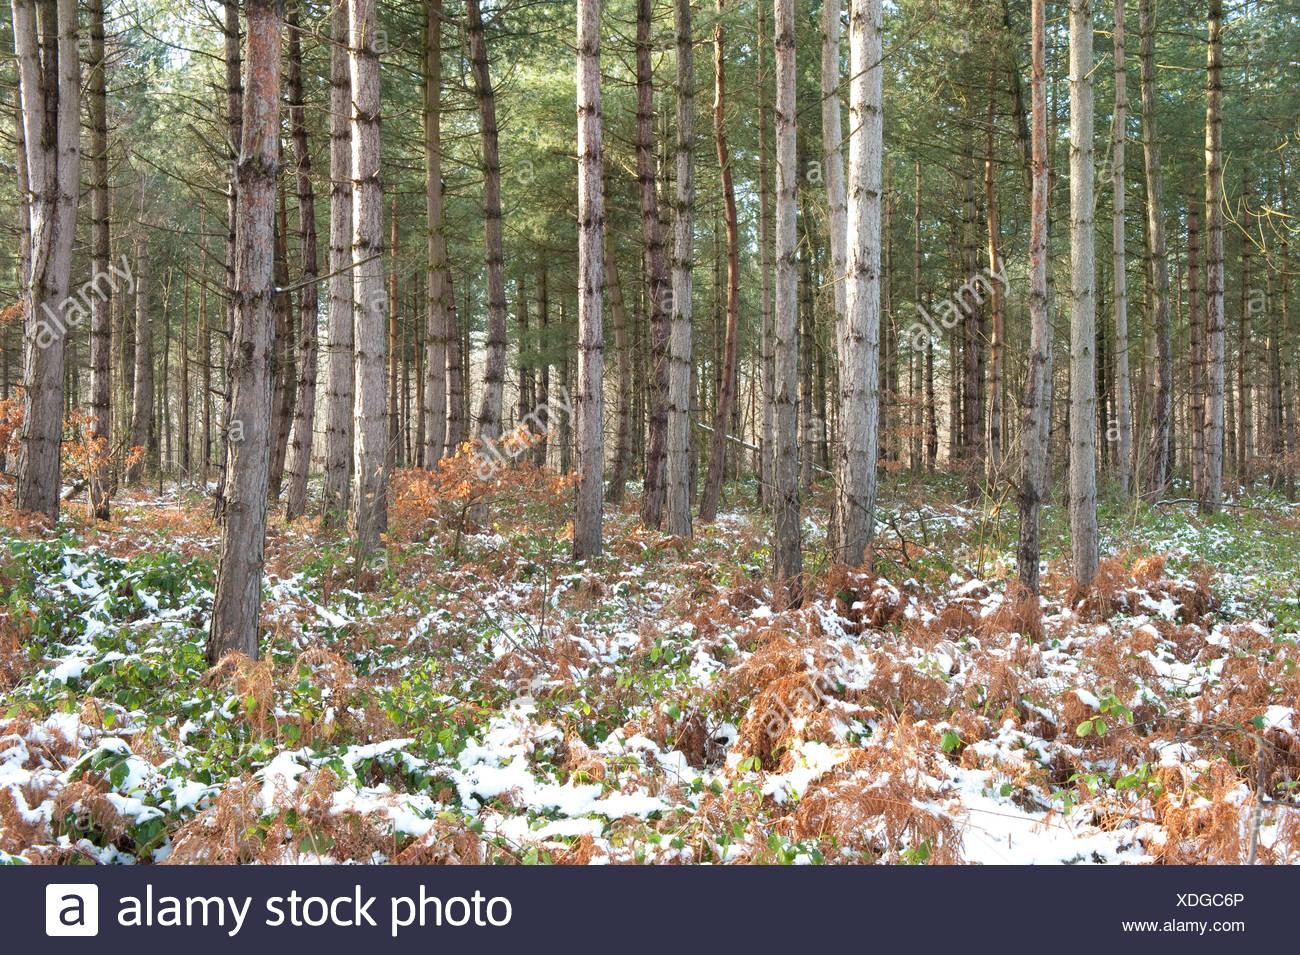 Pine Trees Thornden Woodlands Kent UK - Stock Image